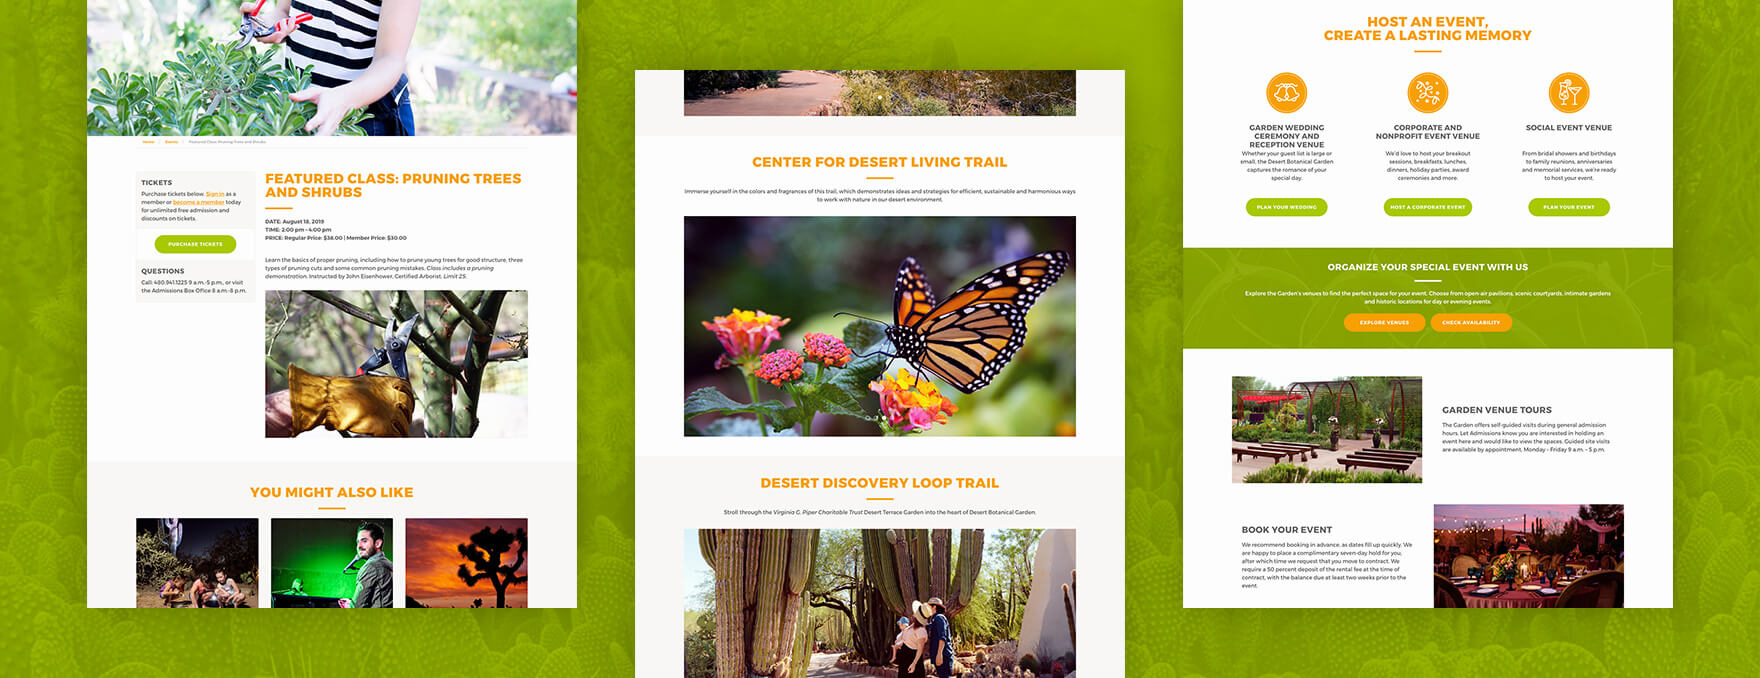 Desert Botanical Garden event page